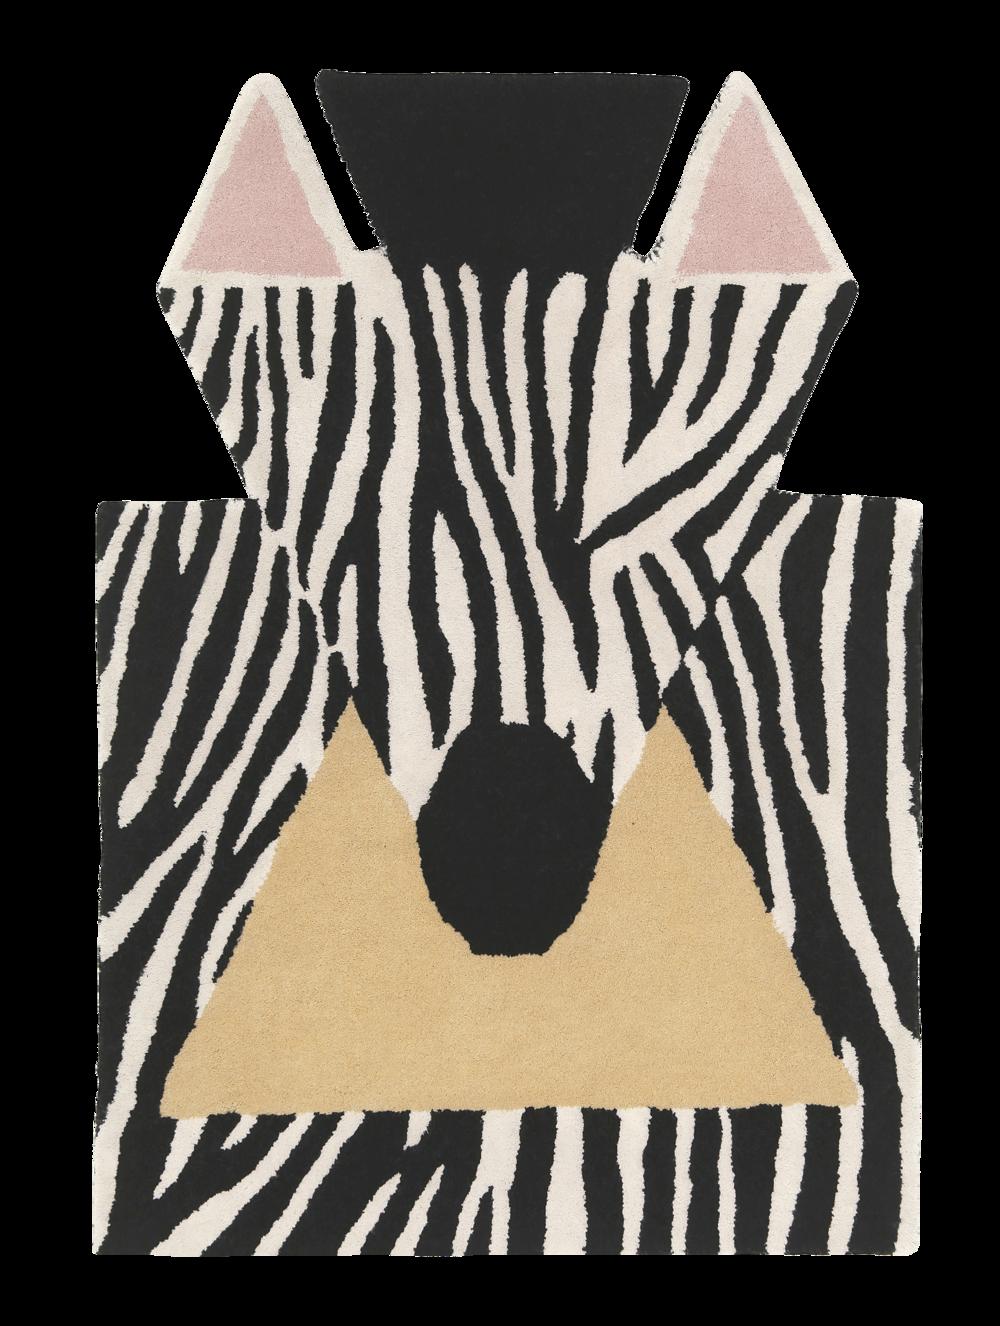 EO_Zebra_Carpet_nbg_lowres.png